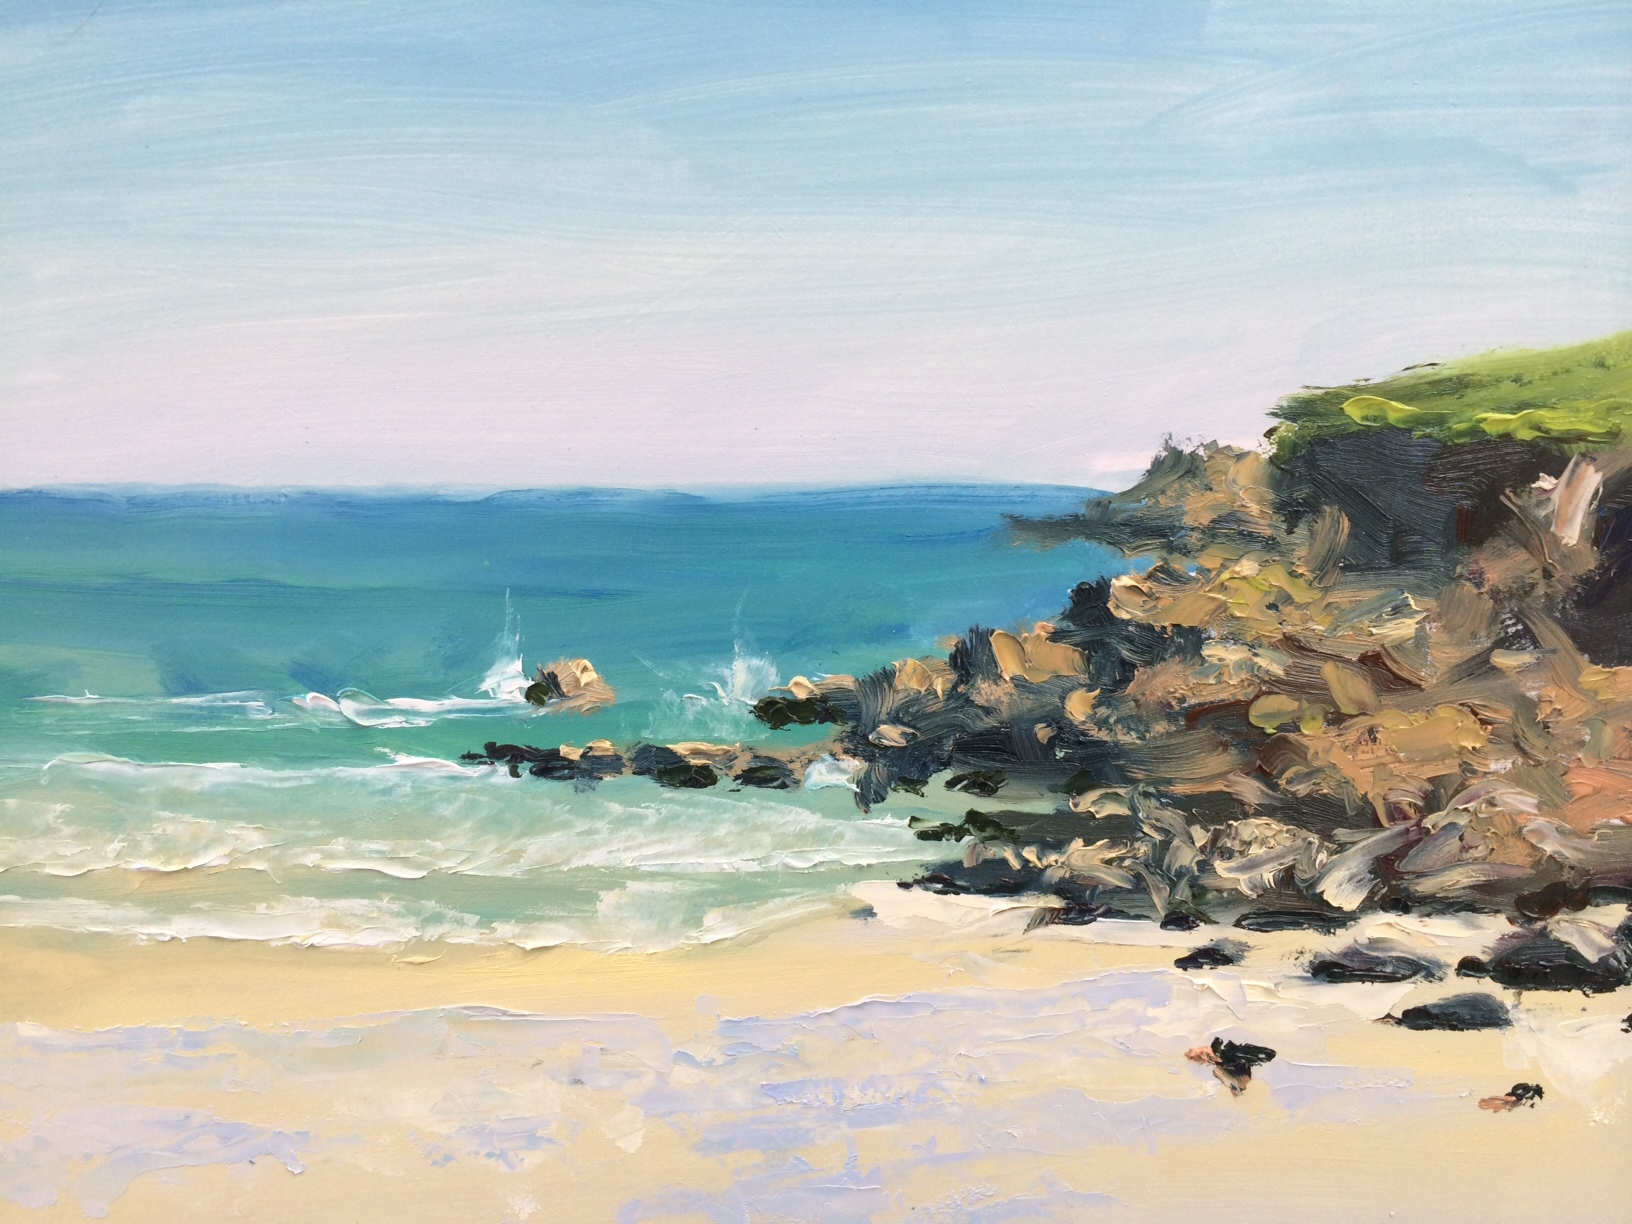 St Ives Porth Meor beach 1